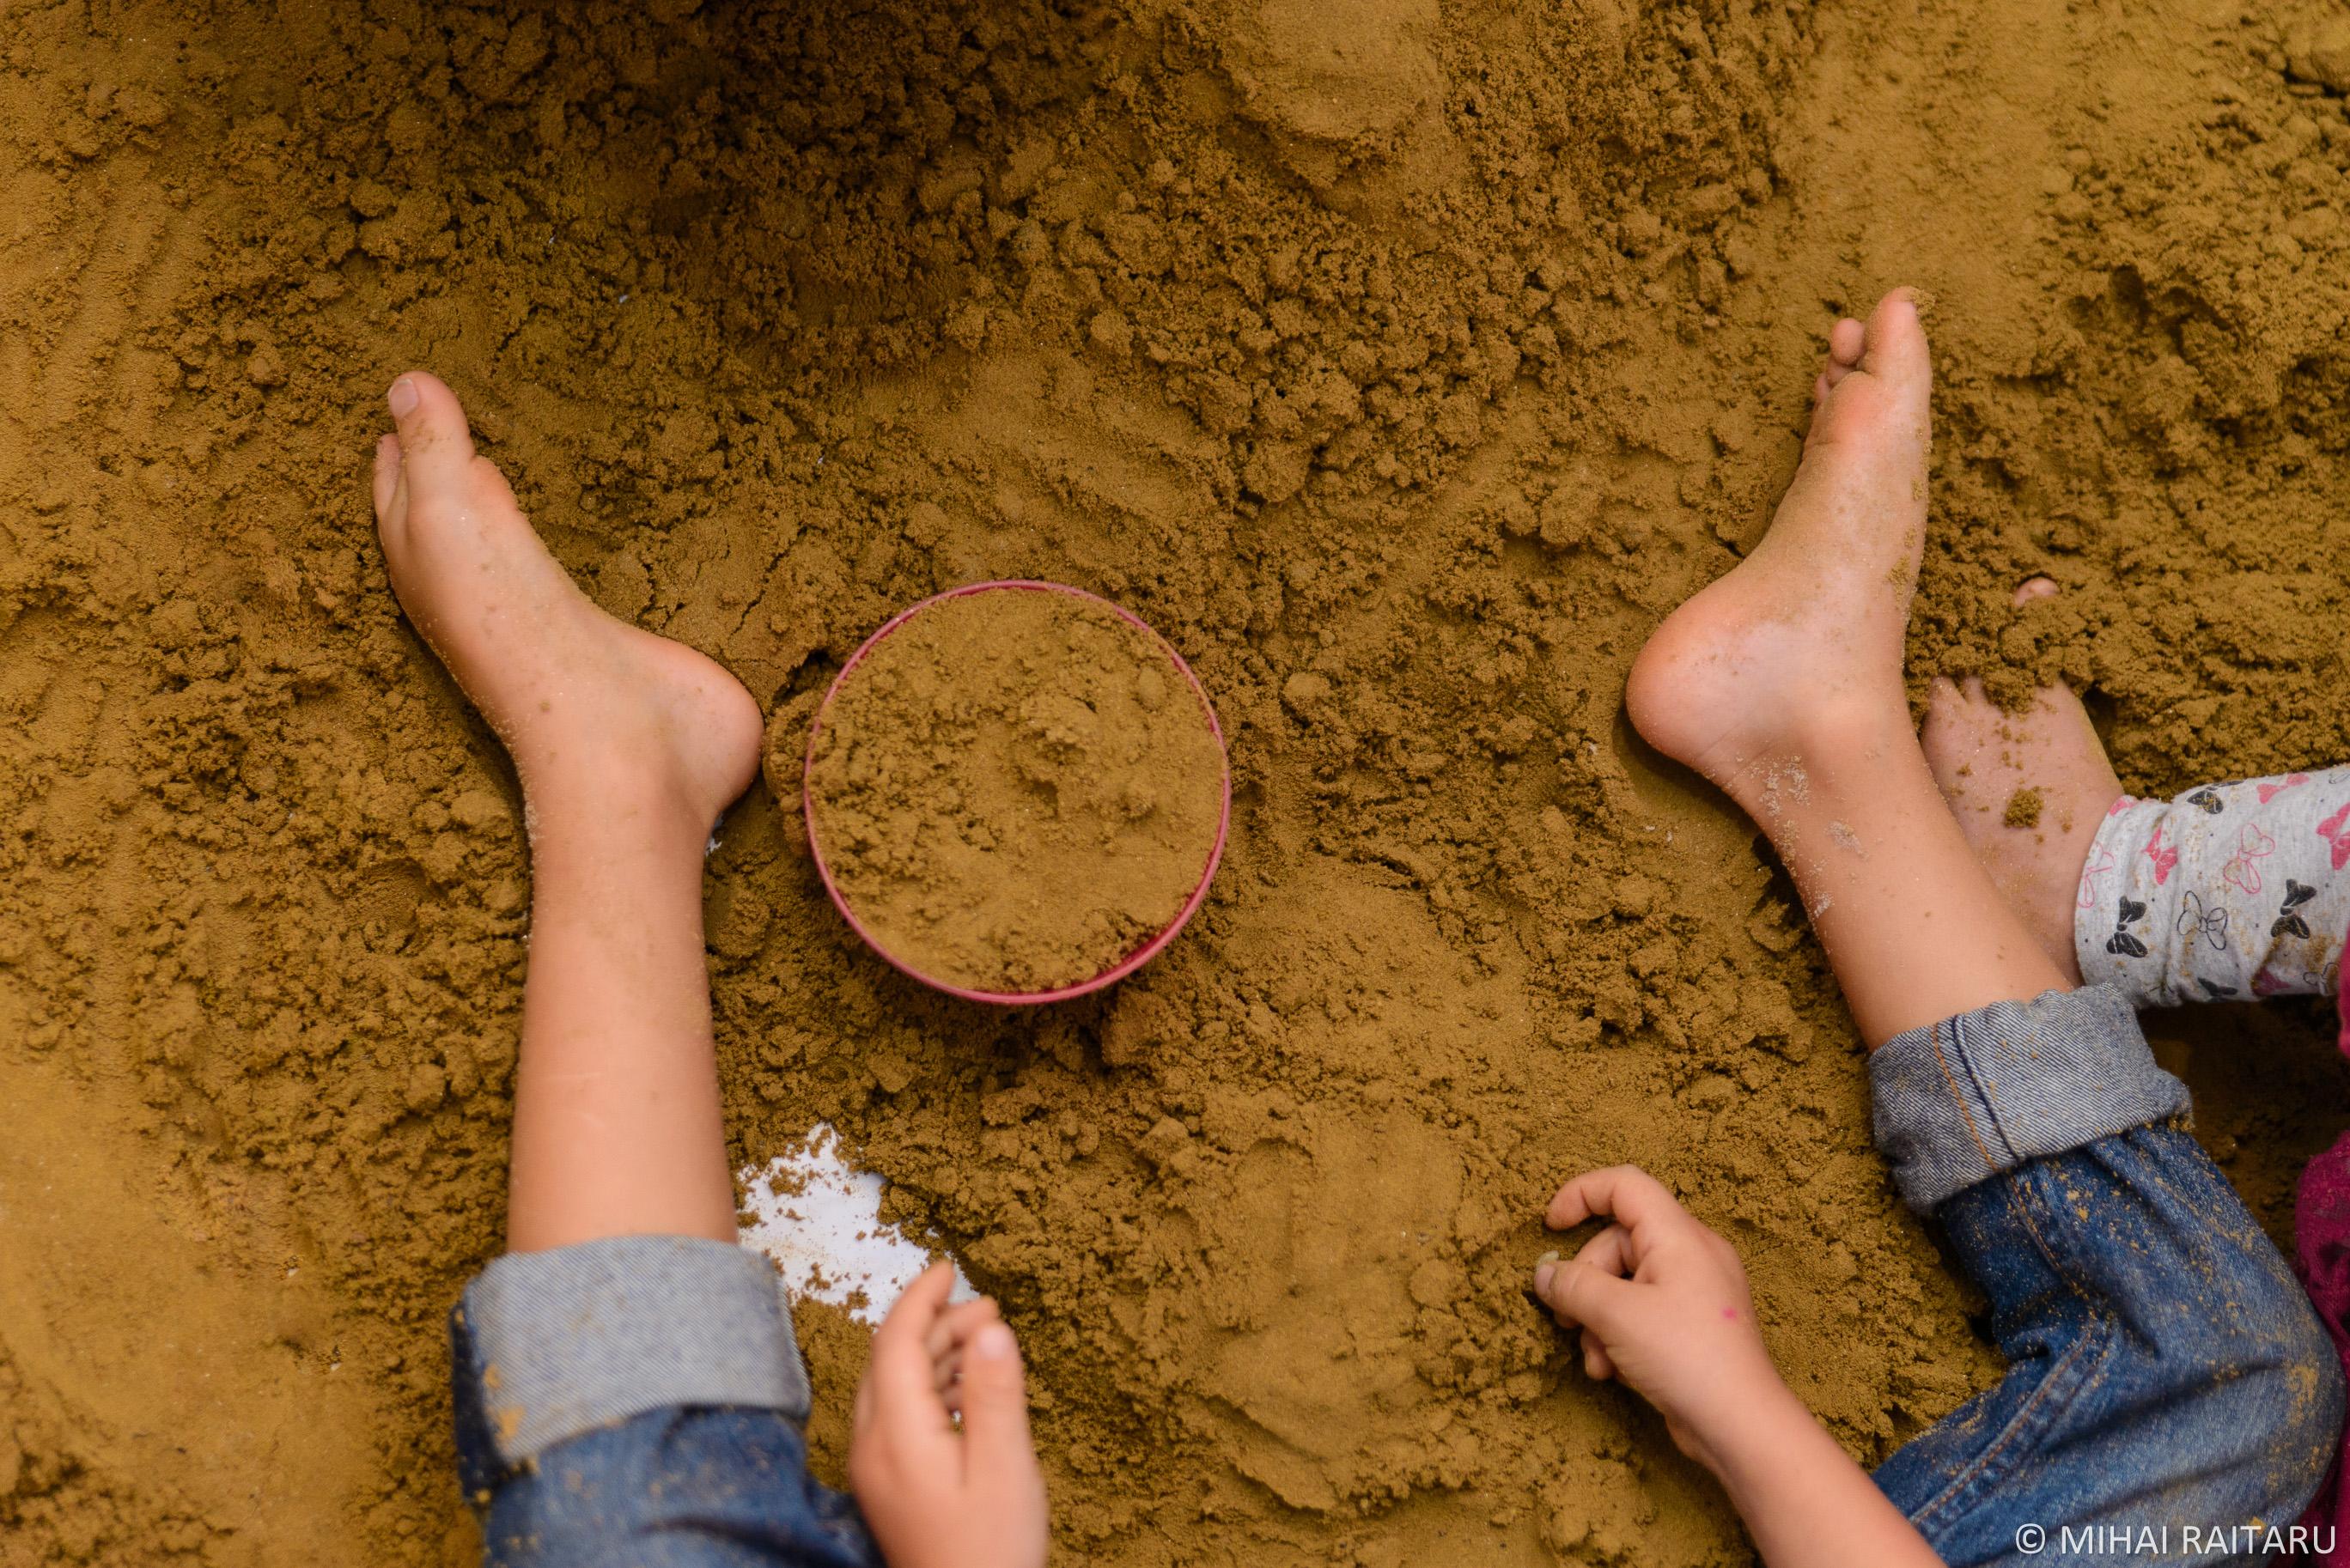 joaca nisip atelier teatru senzorial miniartshow